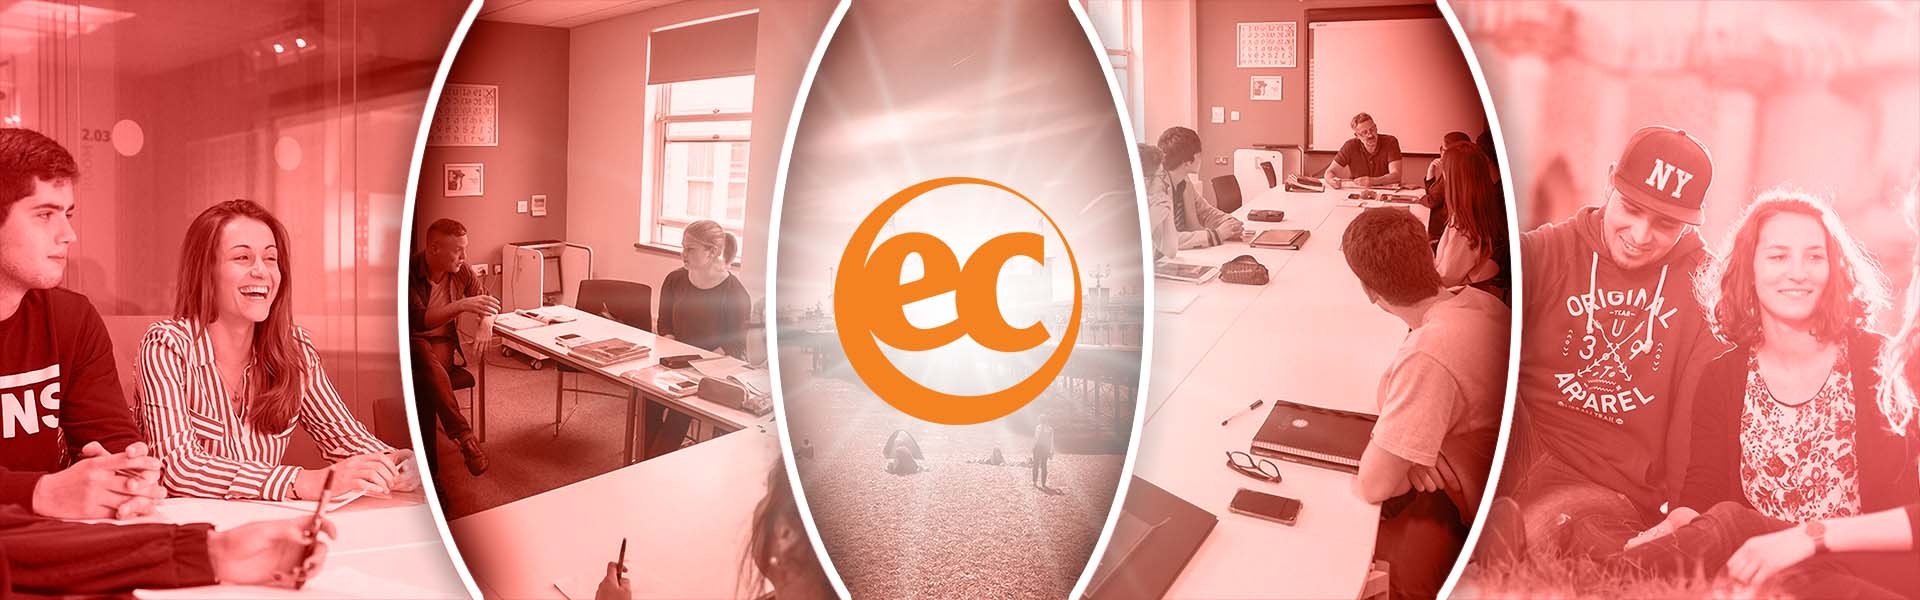 EC English Brighton Dil Okulu